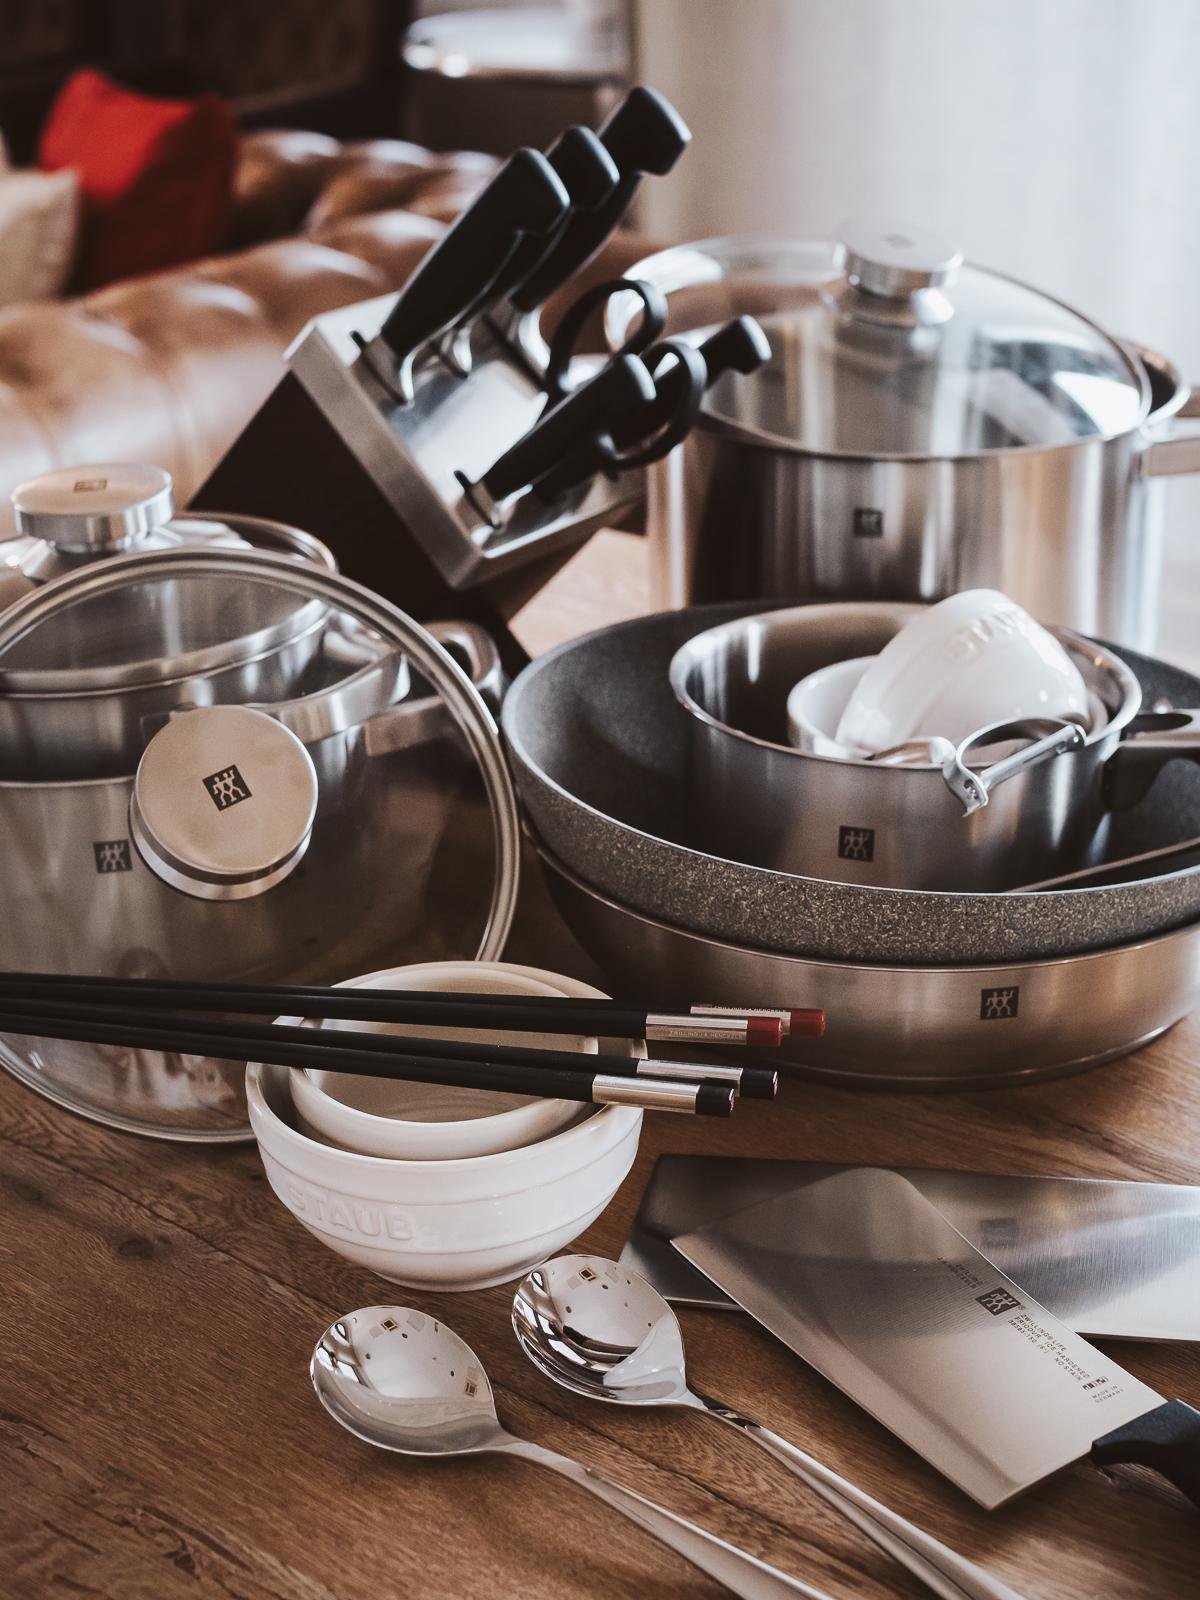 Ingolstadt Village Chinese New Year Lifestyle Shopping & Home Cooking - Olympus EM1Markii 2512 - Yes! Please Enjoy by Fanning Tseng-81.jpg